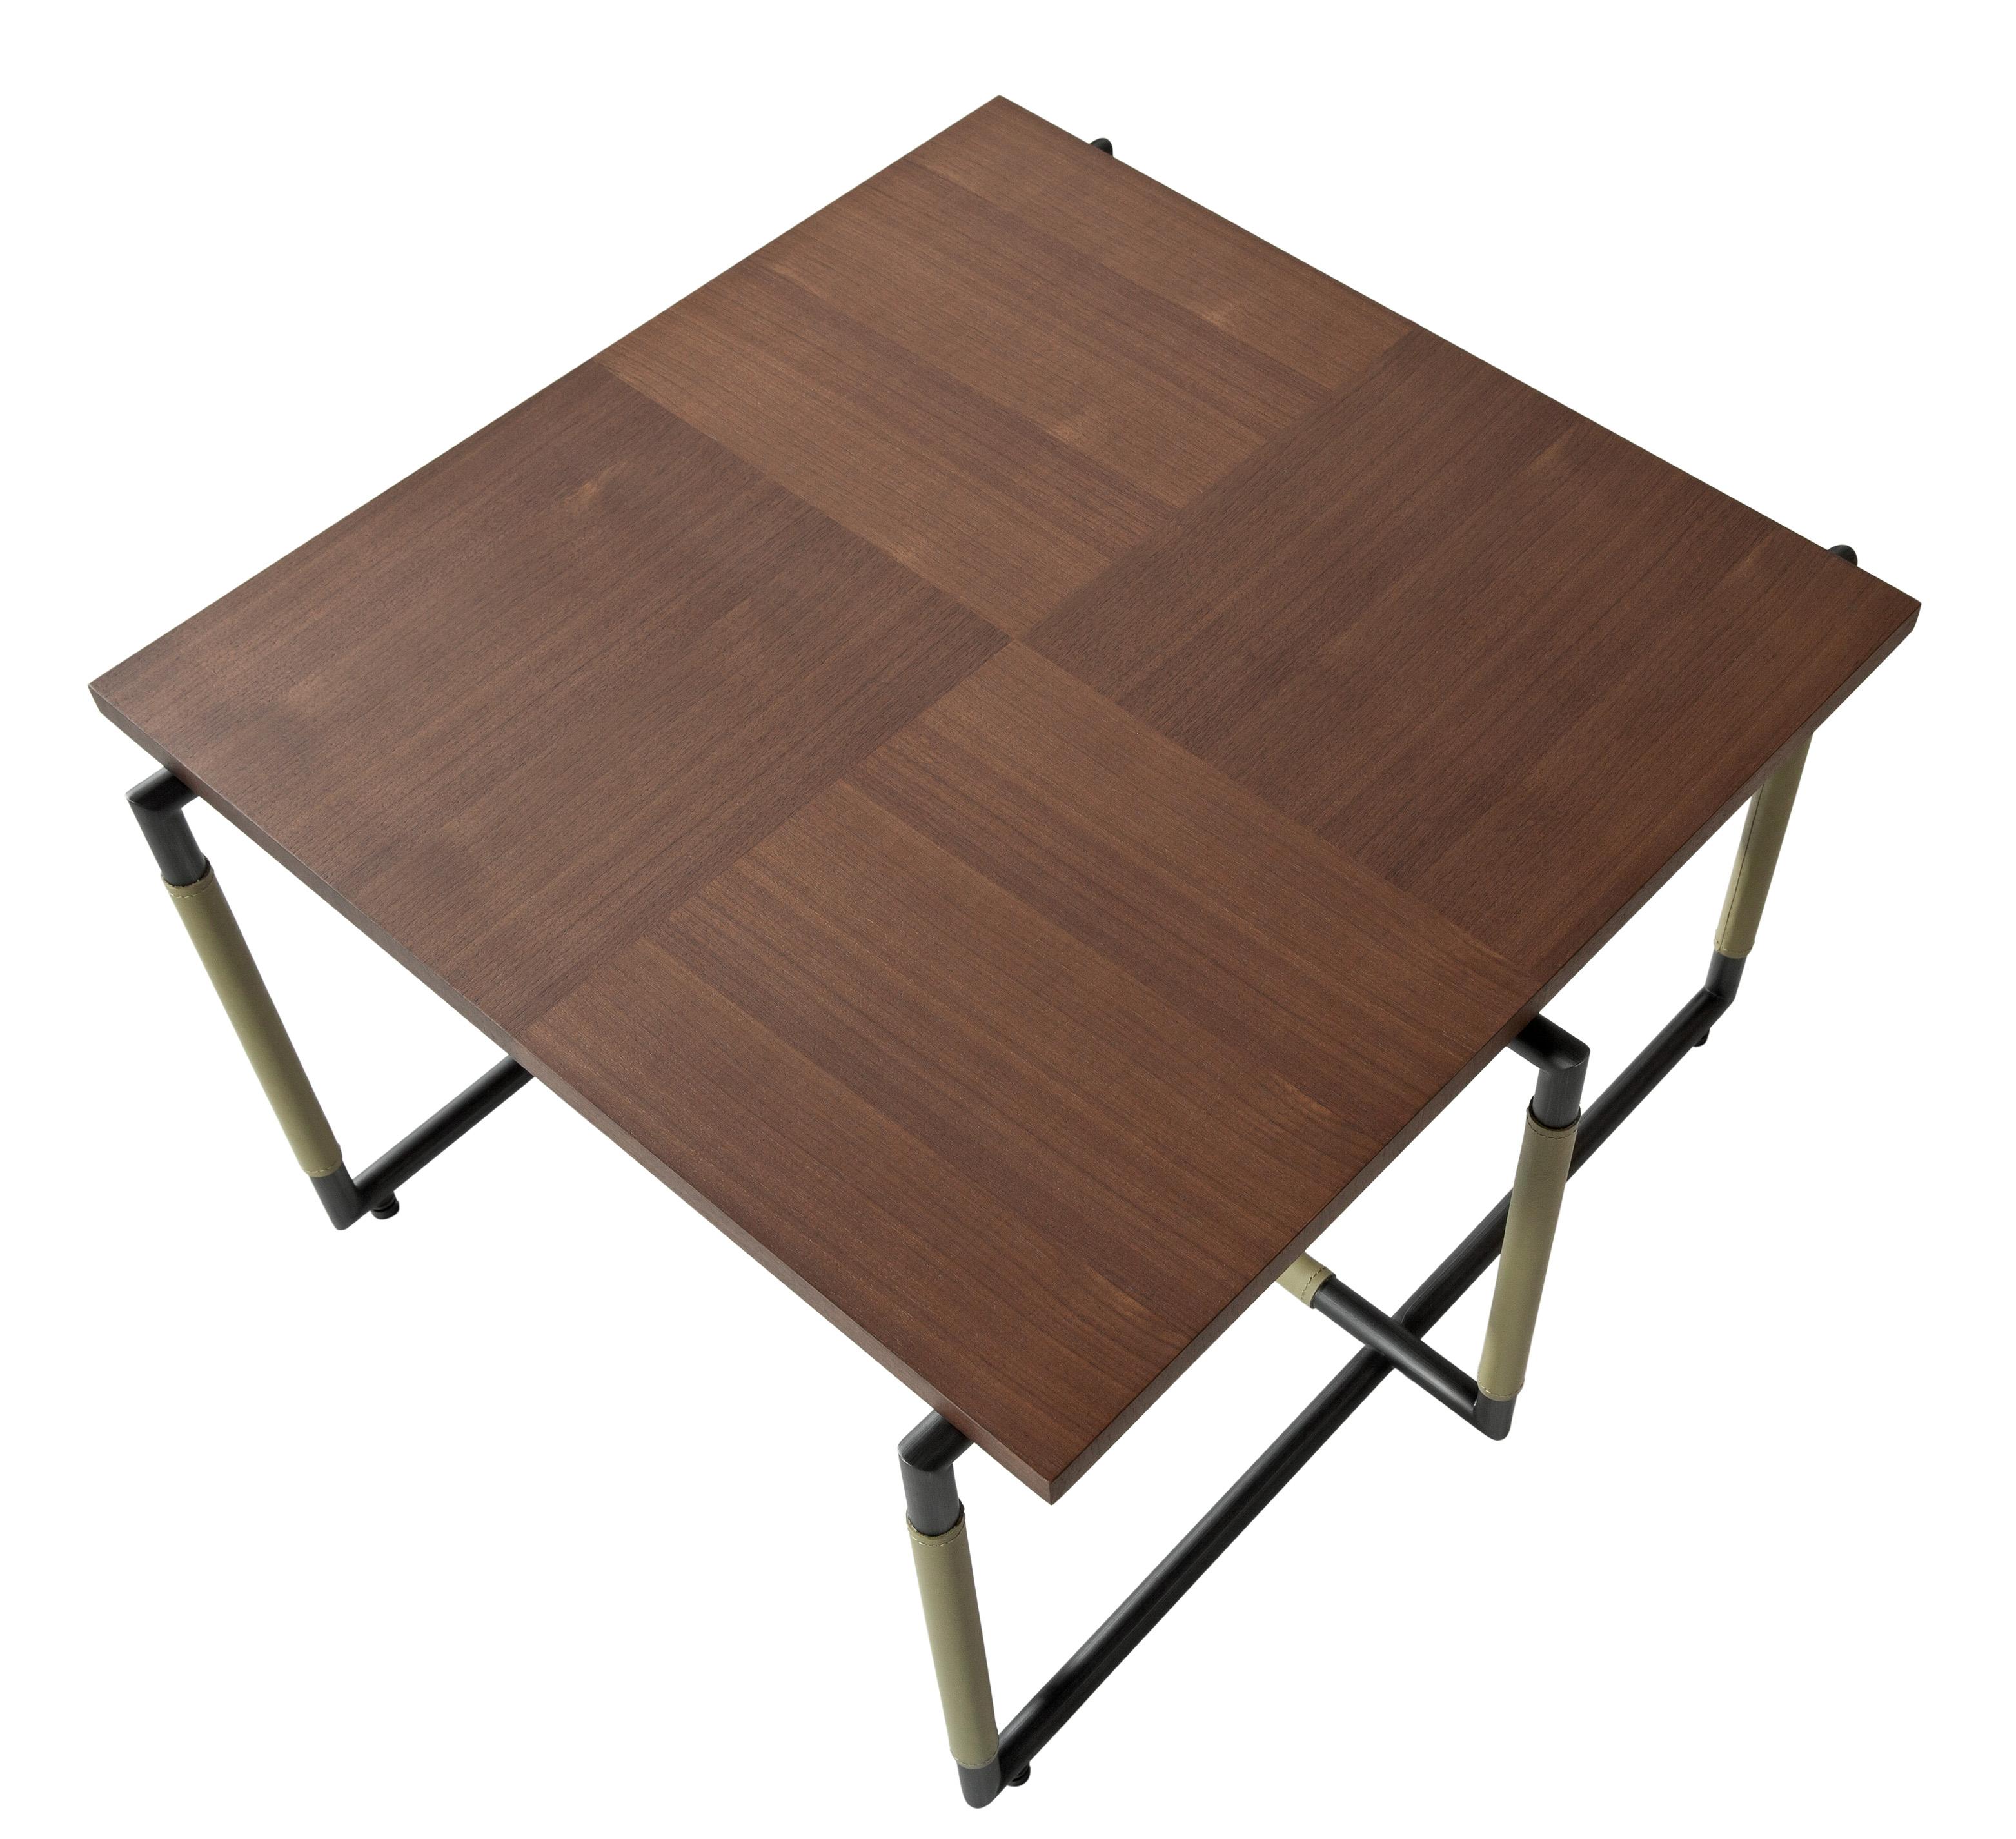 Frag_Bak_coffee table_by F.Laviani.jpg